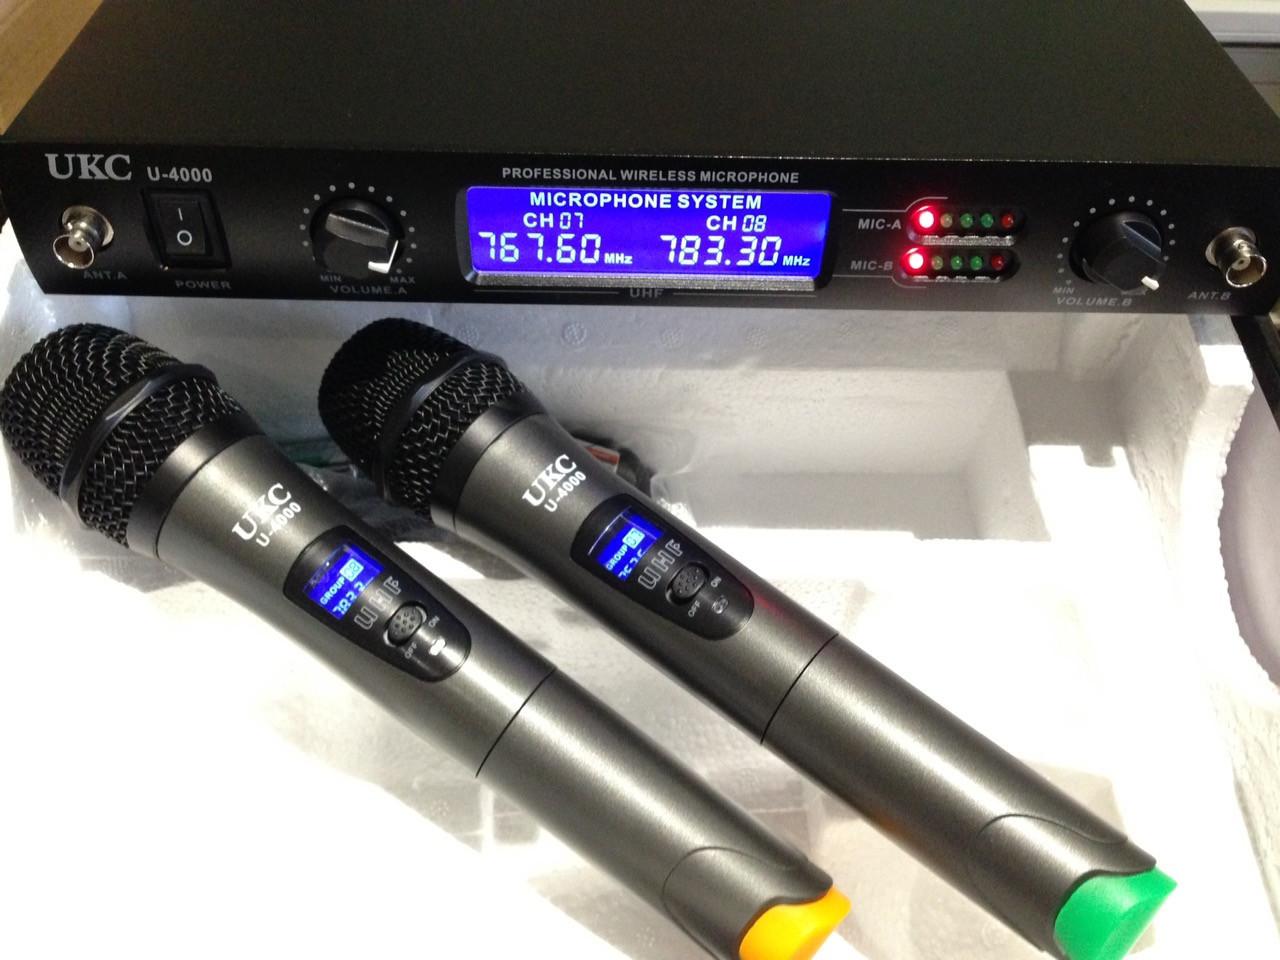 Микрофон UKC DM-4000  UHF база 2 радиомикрофона  Качество !!!